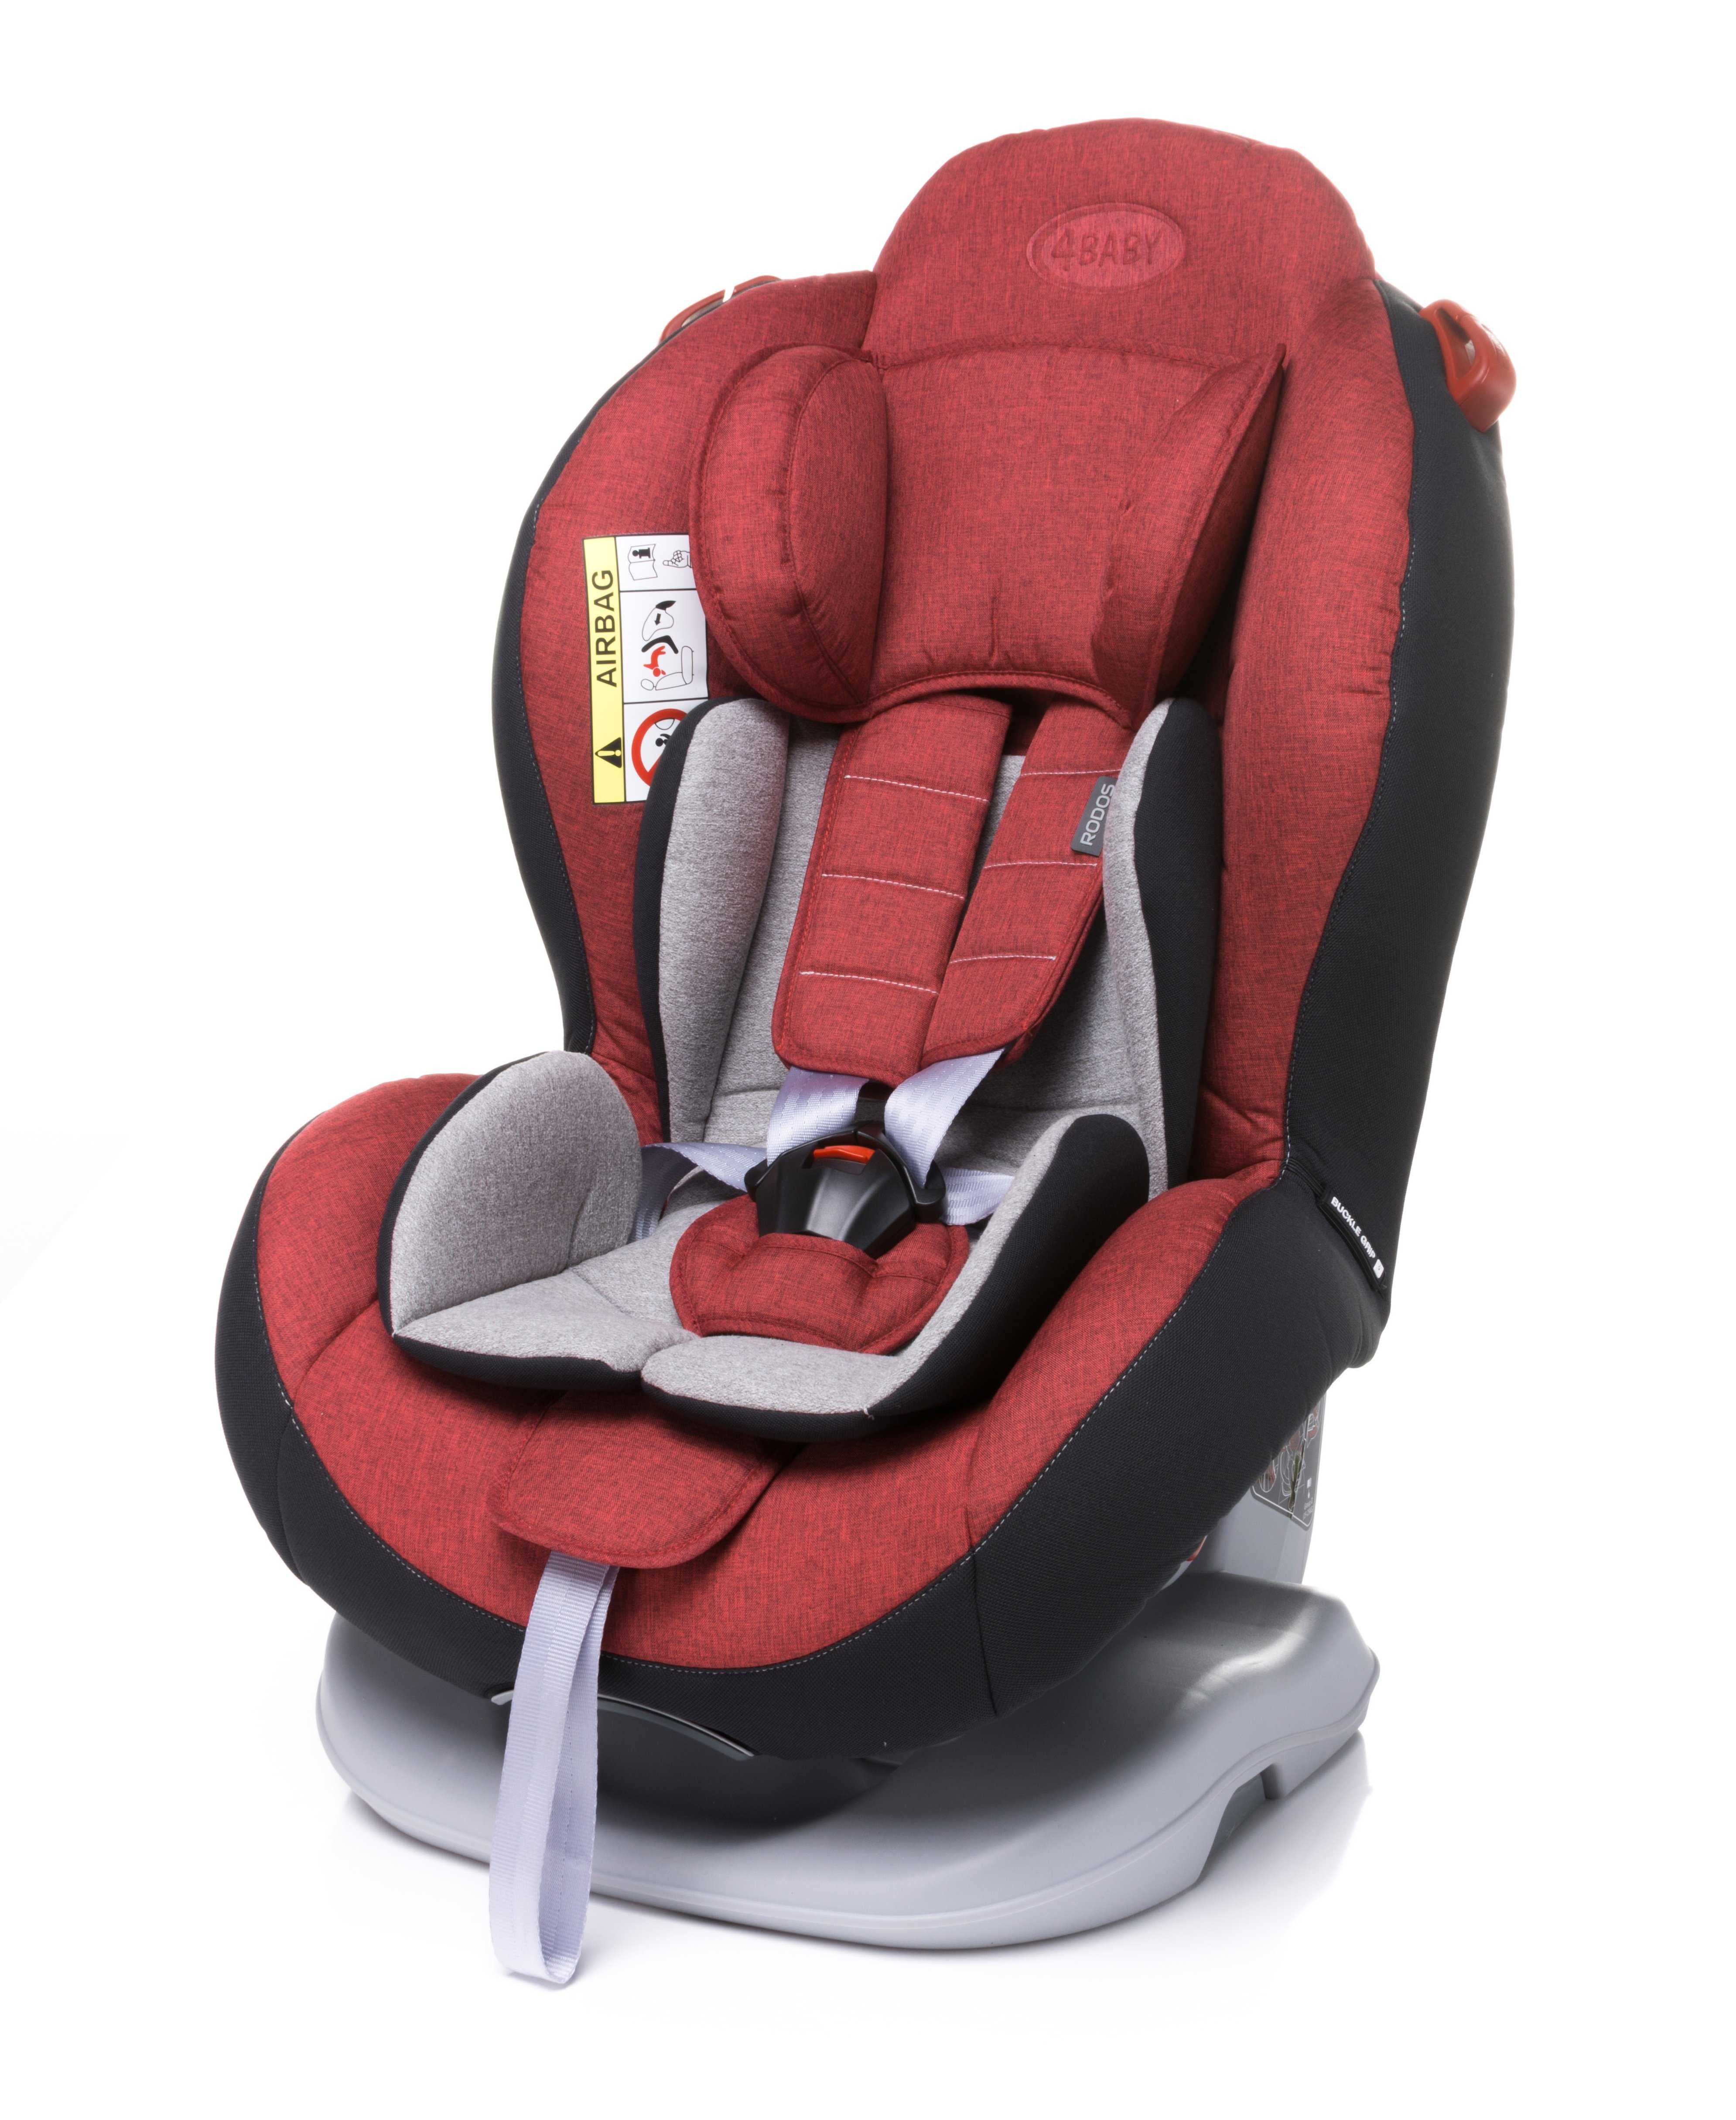 Bērnu autosēdeklis 0-25 kg 4BABY RODOS red